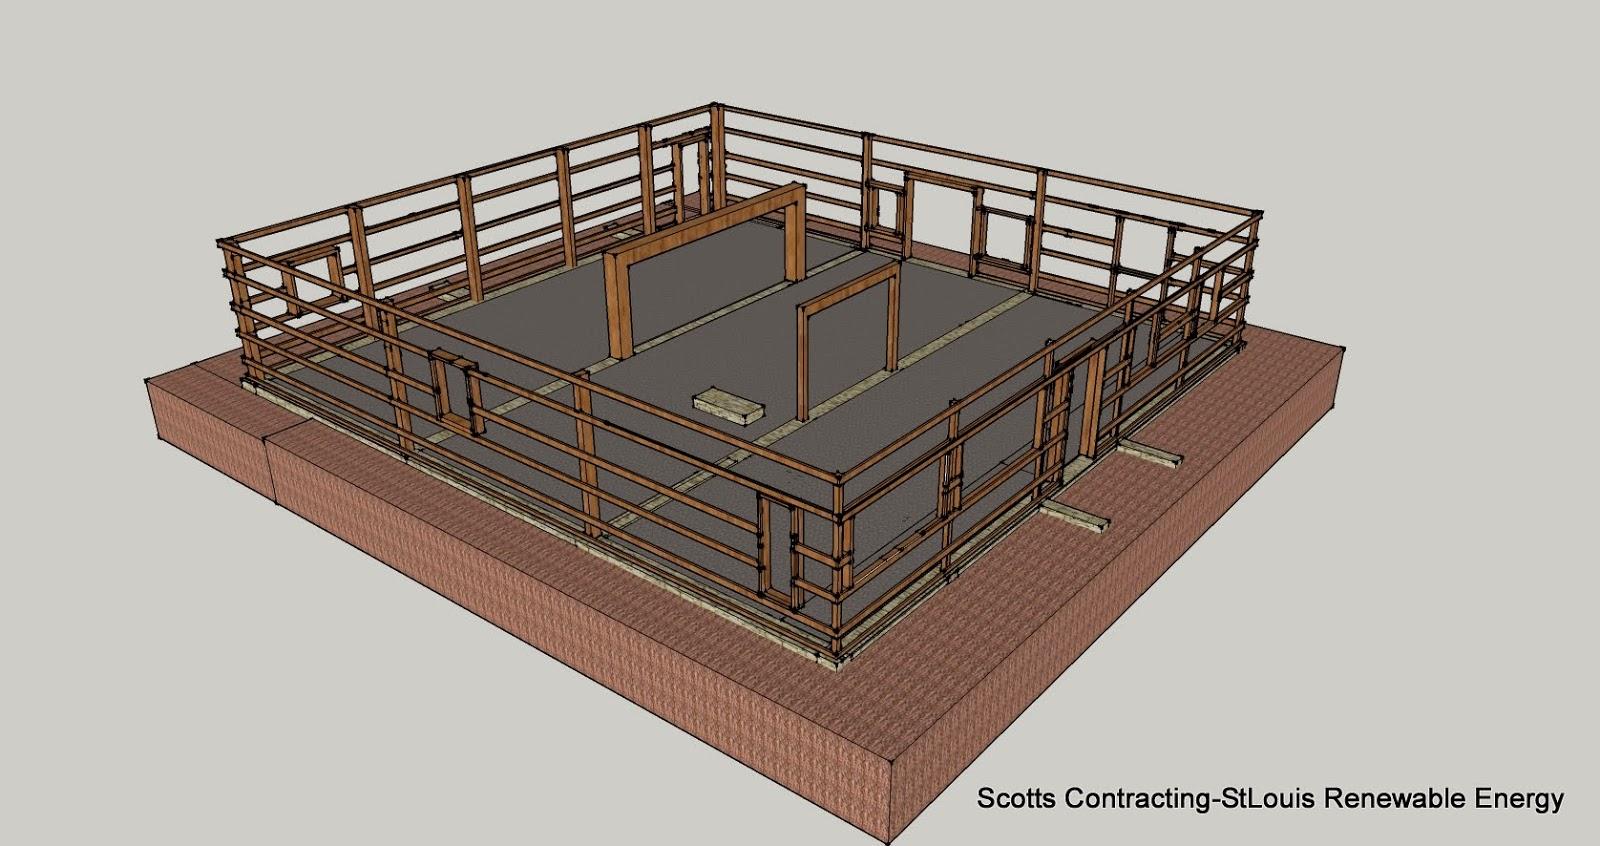 Comparing Post Frame Residential Building Designs to Stick Built Frame Building